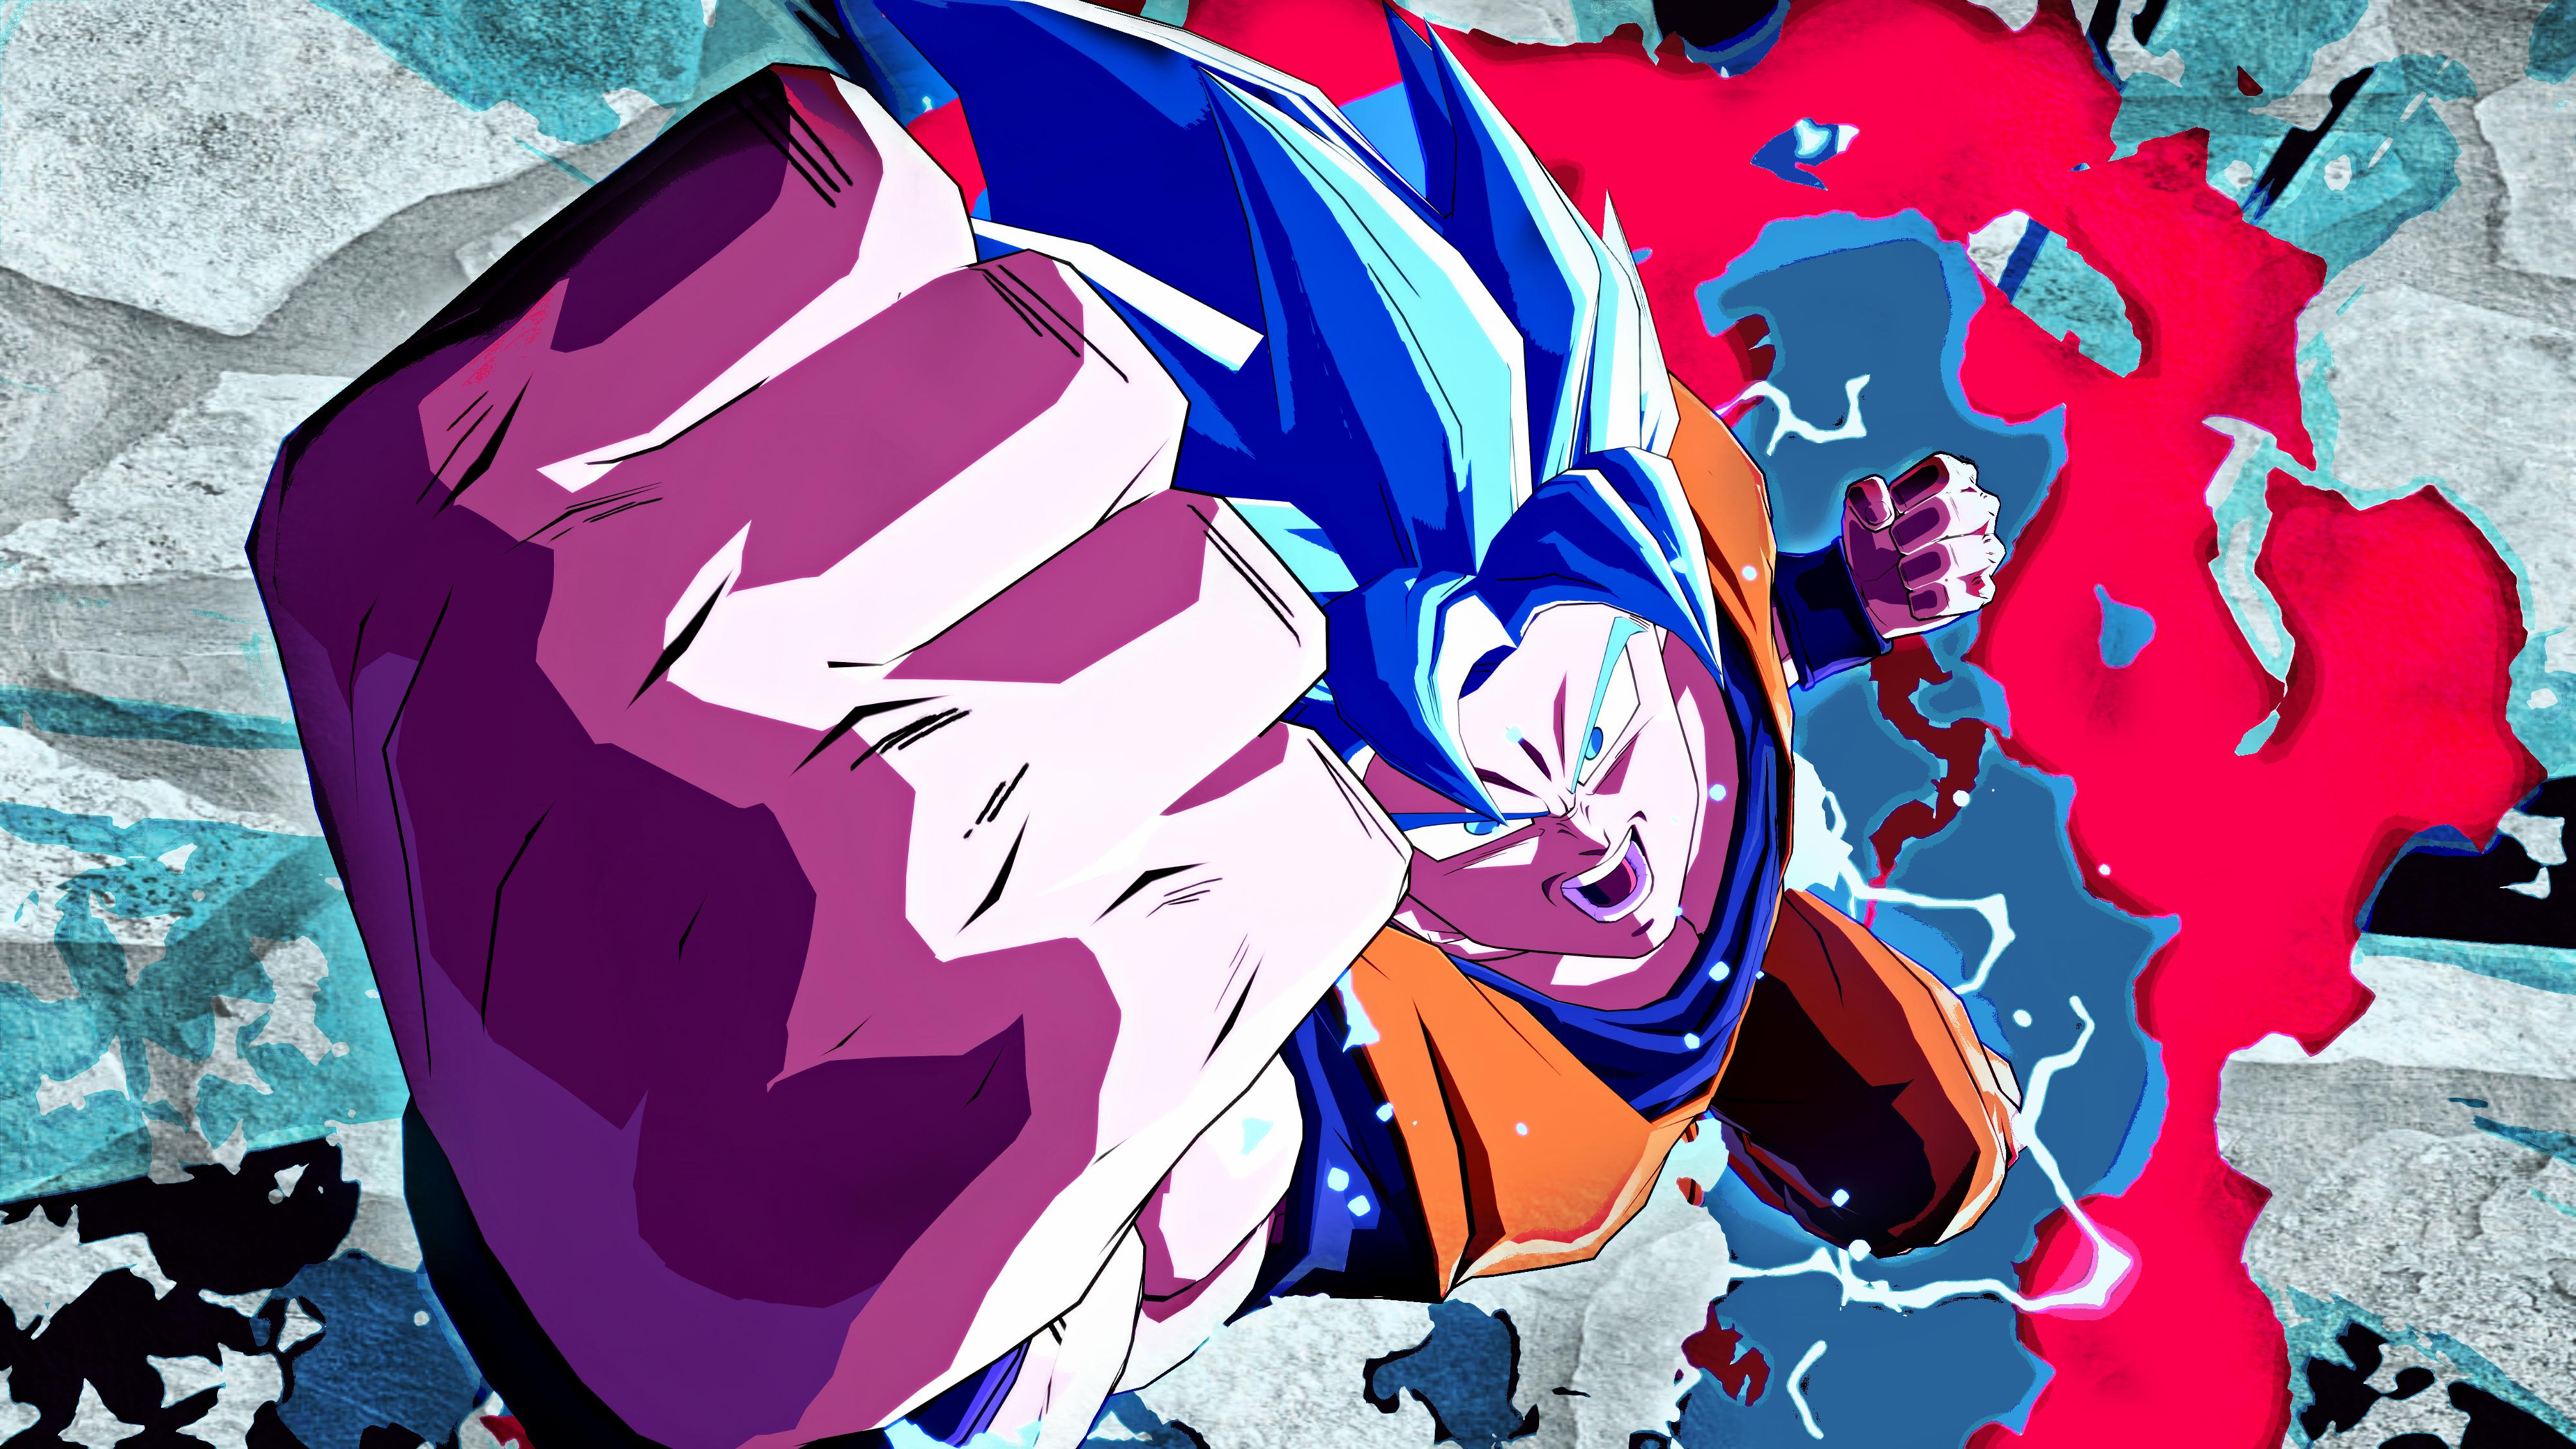 Goku Ssj Blue Kaioken Dragon Ball Fighterz By Bodskih On Deviantart